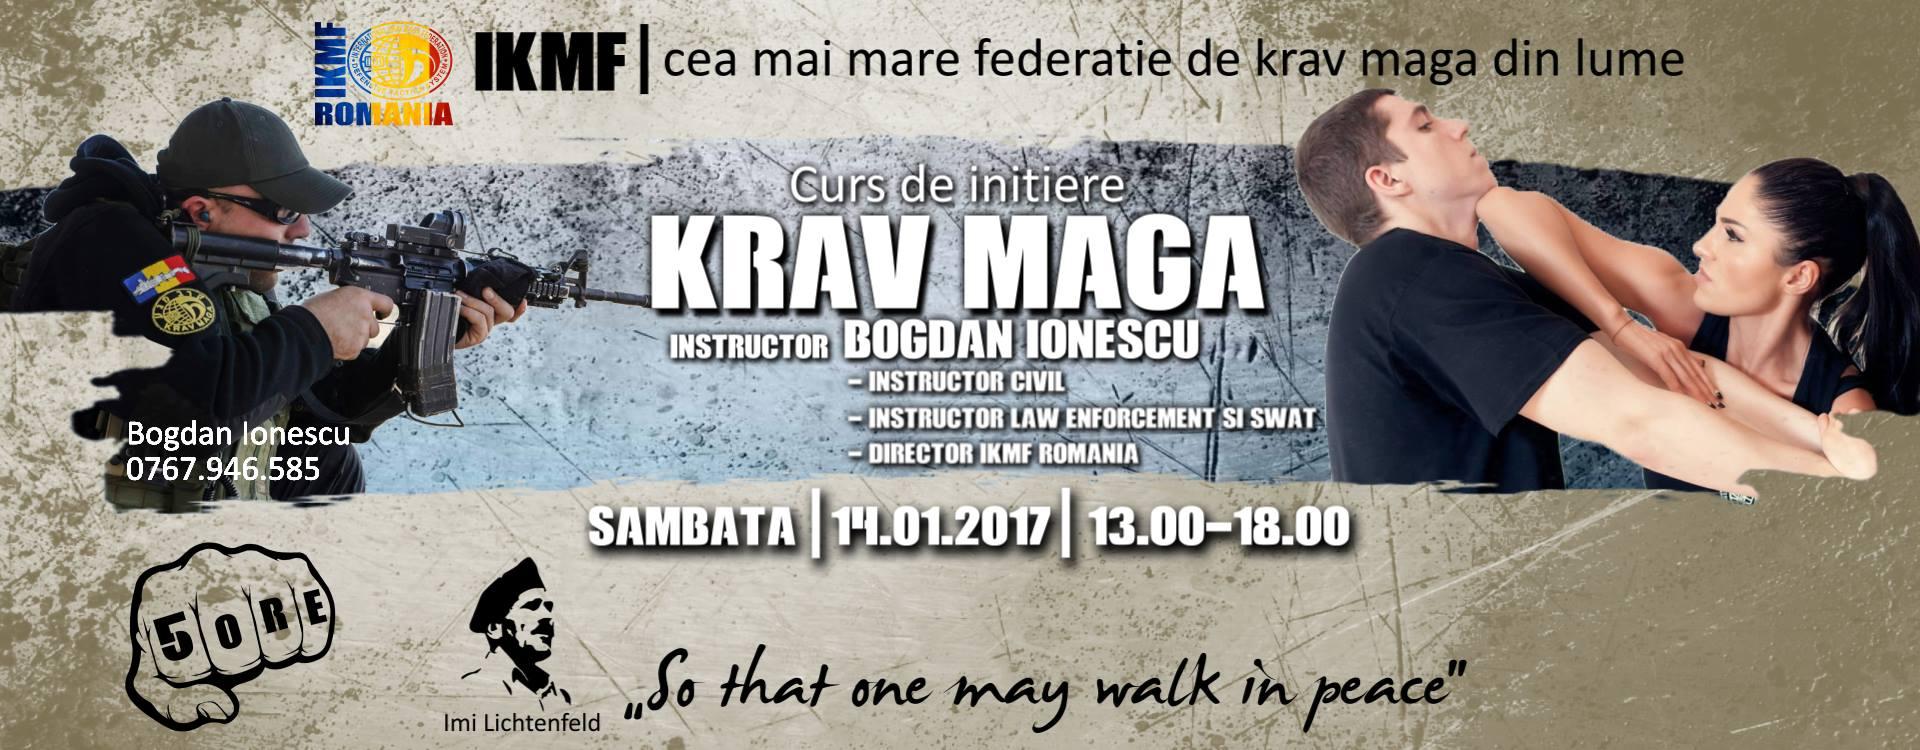 Curs de inițiere Krav Maga